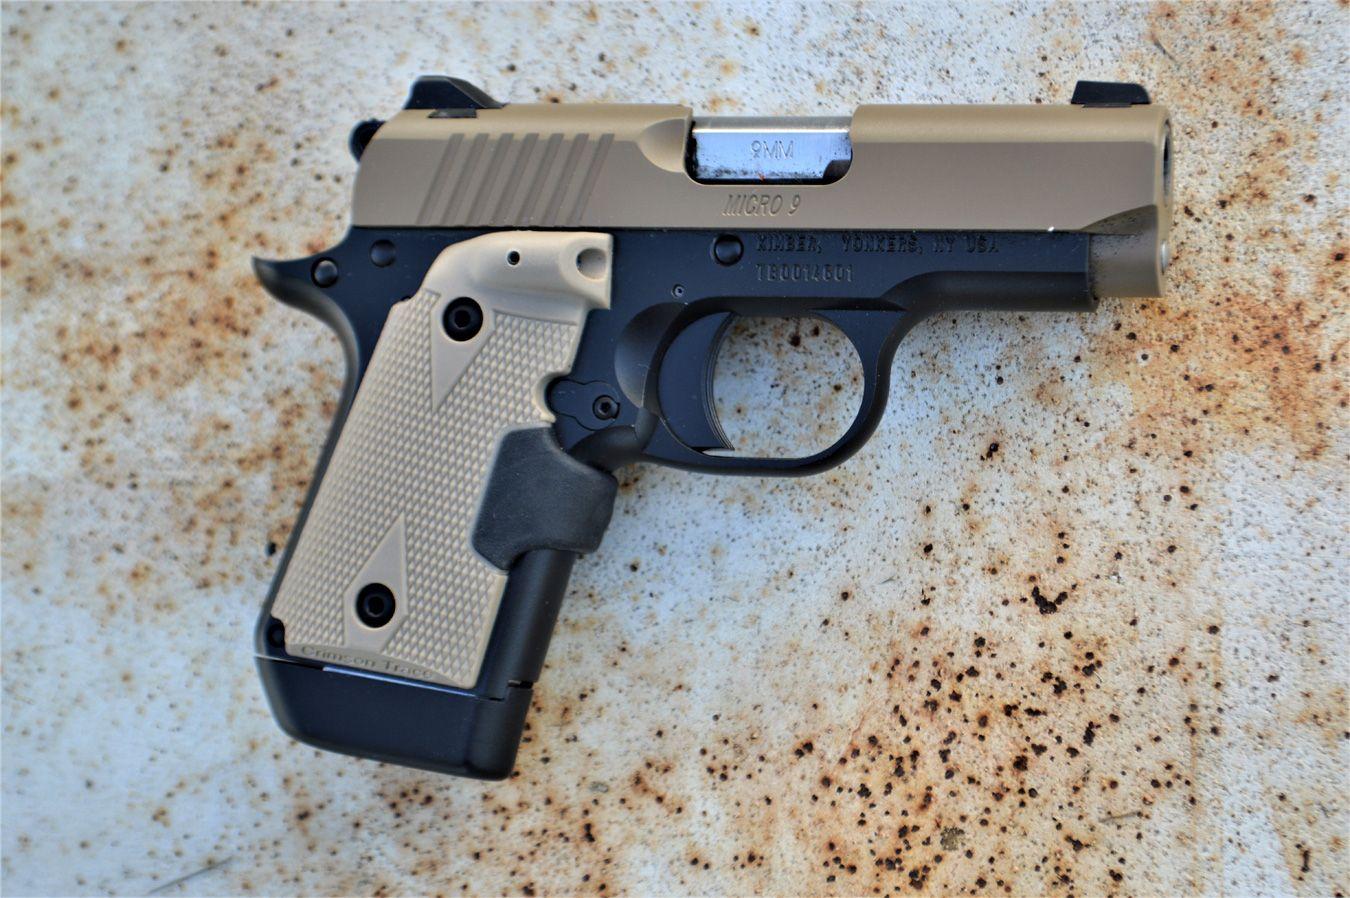 Kimber Micro 9 pistol with Crimson Trace Lasergrip